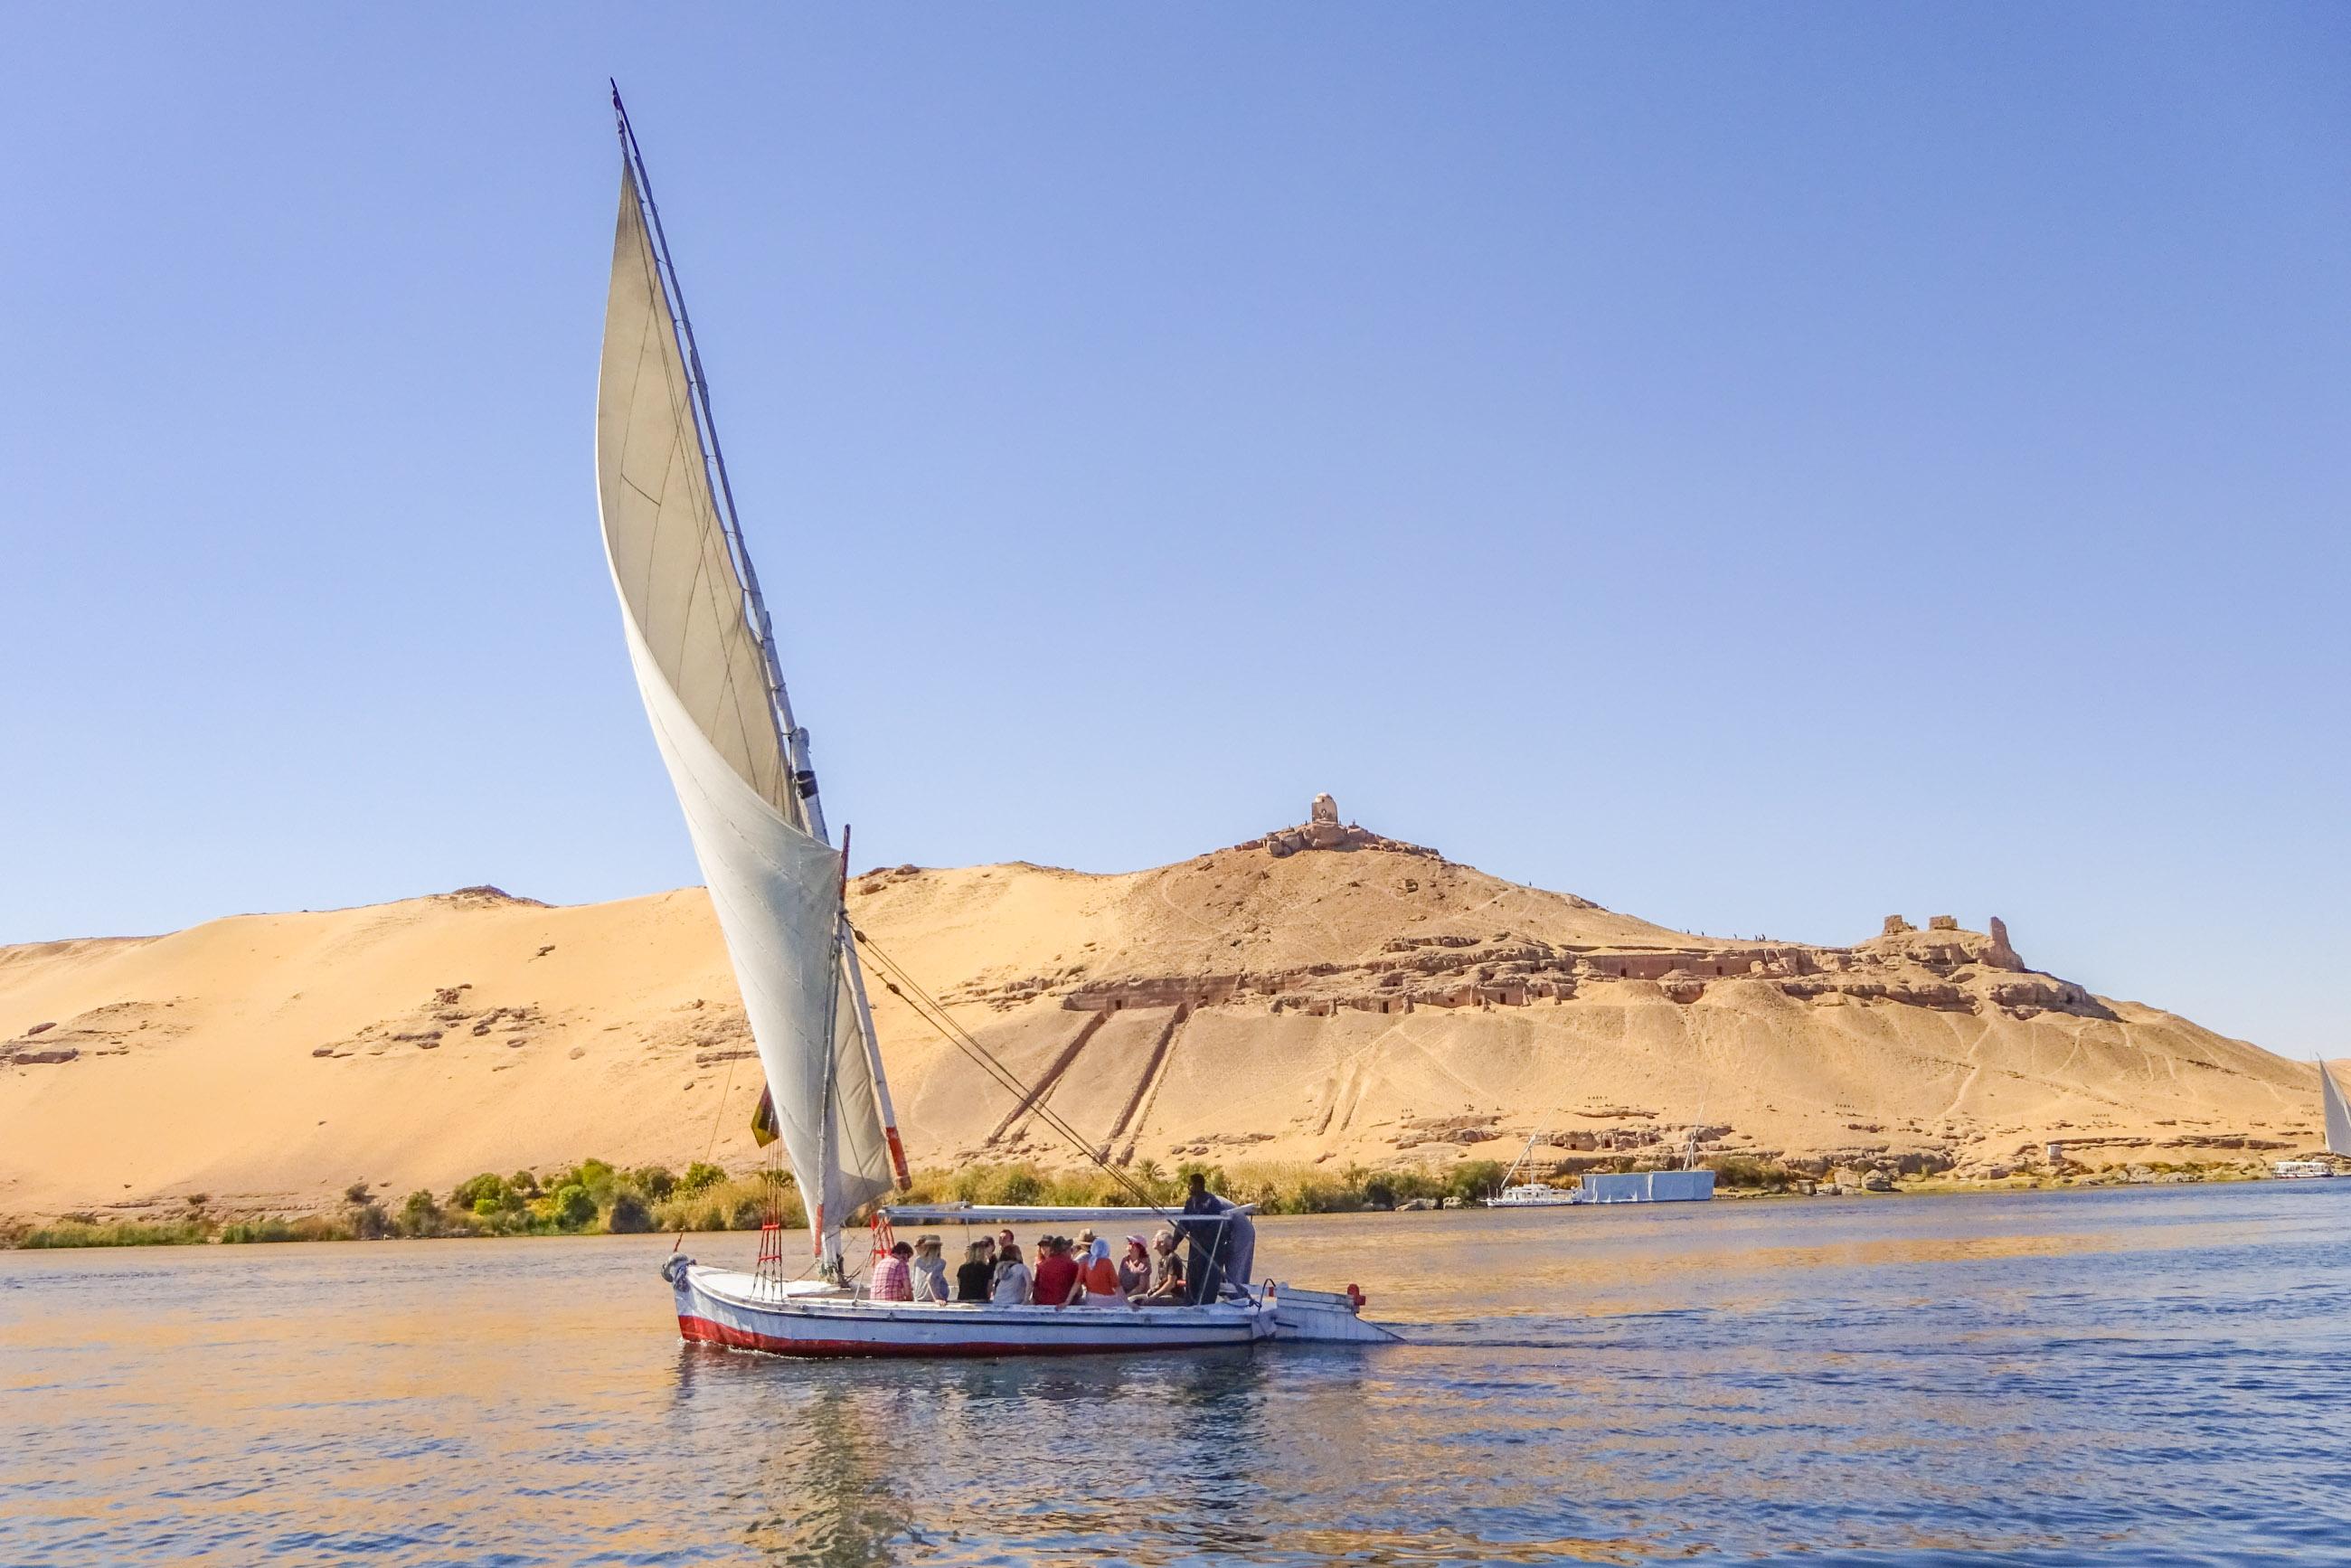 https://bubo.sk/uploads/galleries/17820/miroslavadlha_egypt_aswan-17-.jpg